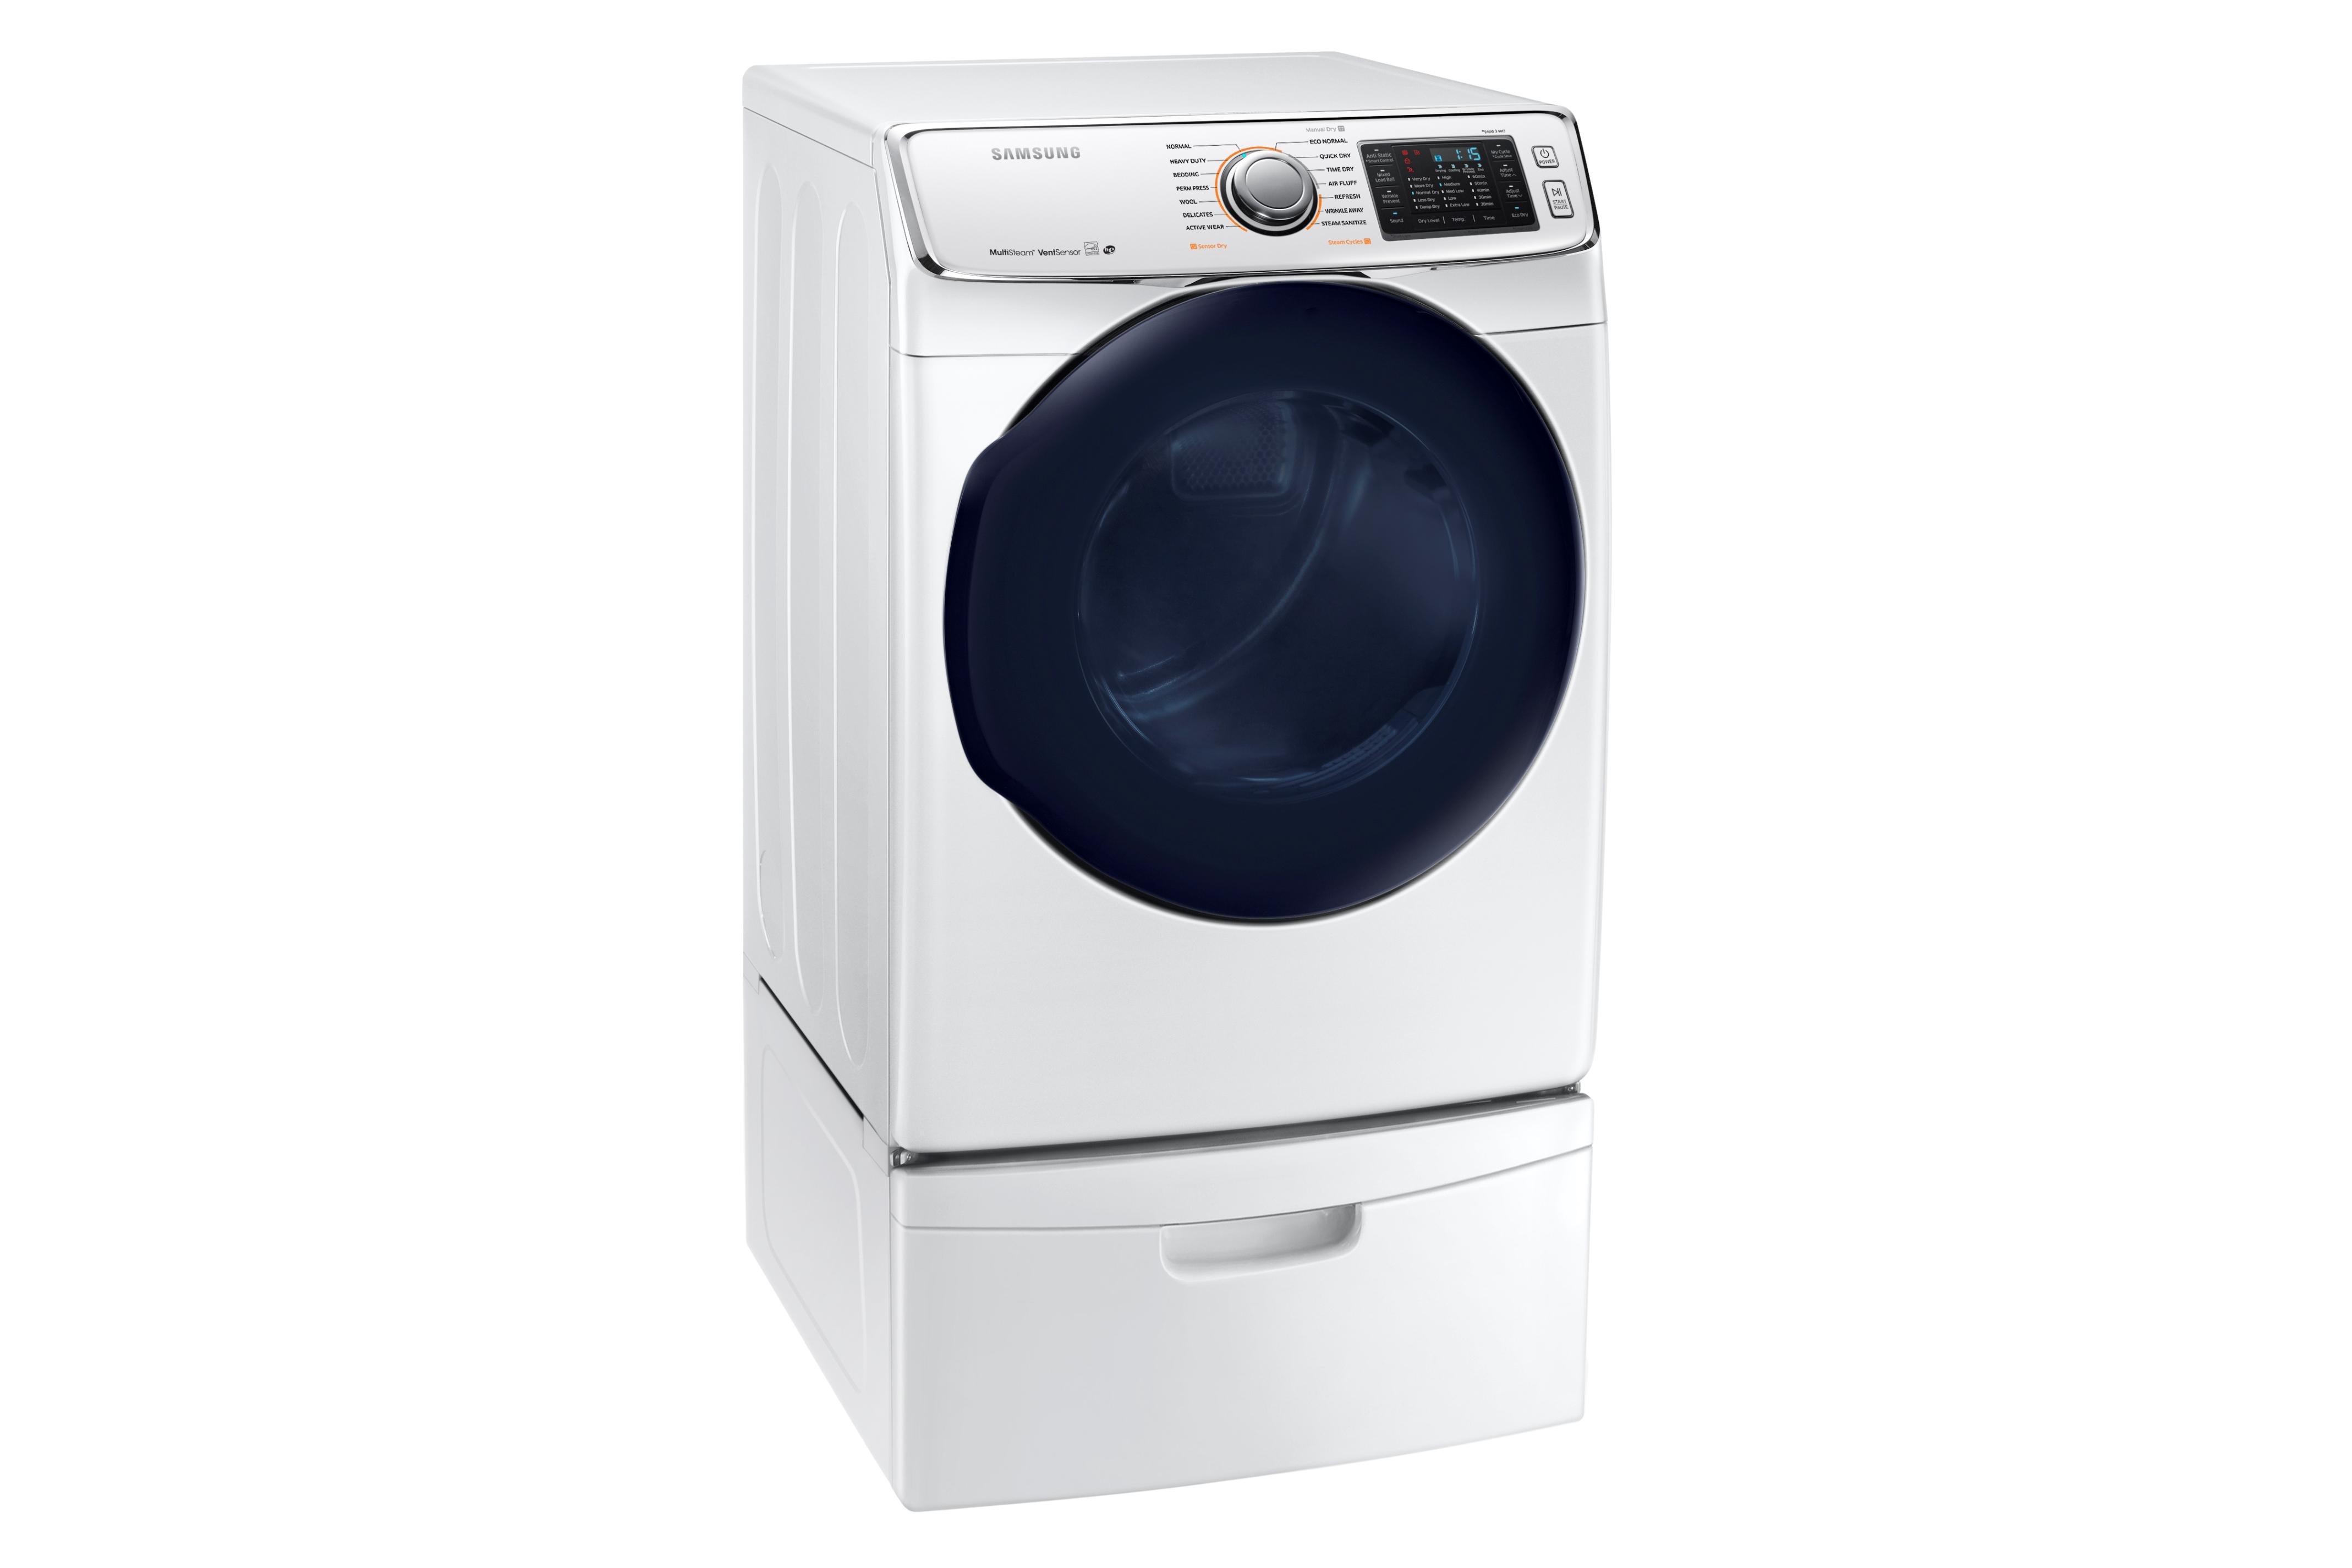 Samsung DV45K6500GW 7.5 cu. ft. Capacity Gas Dryer White